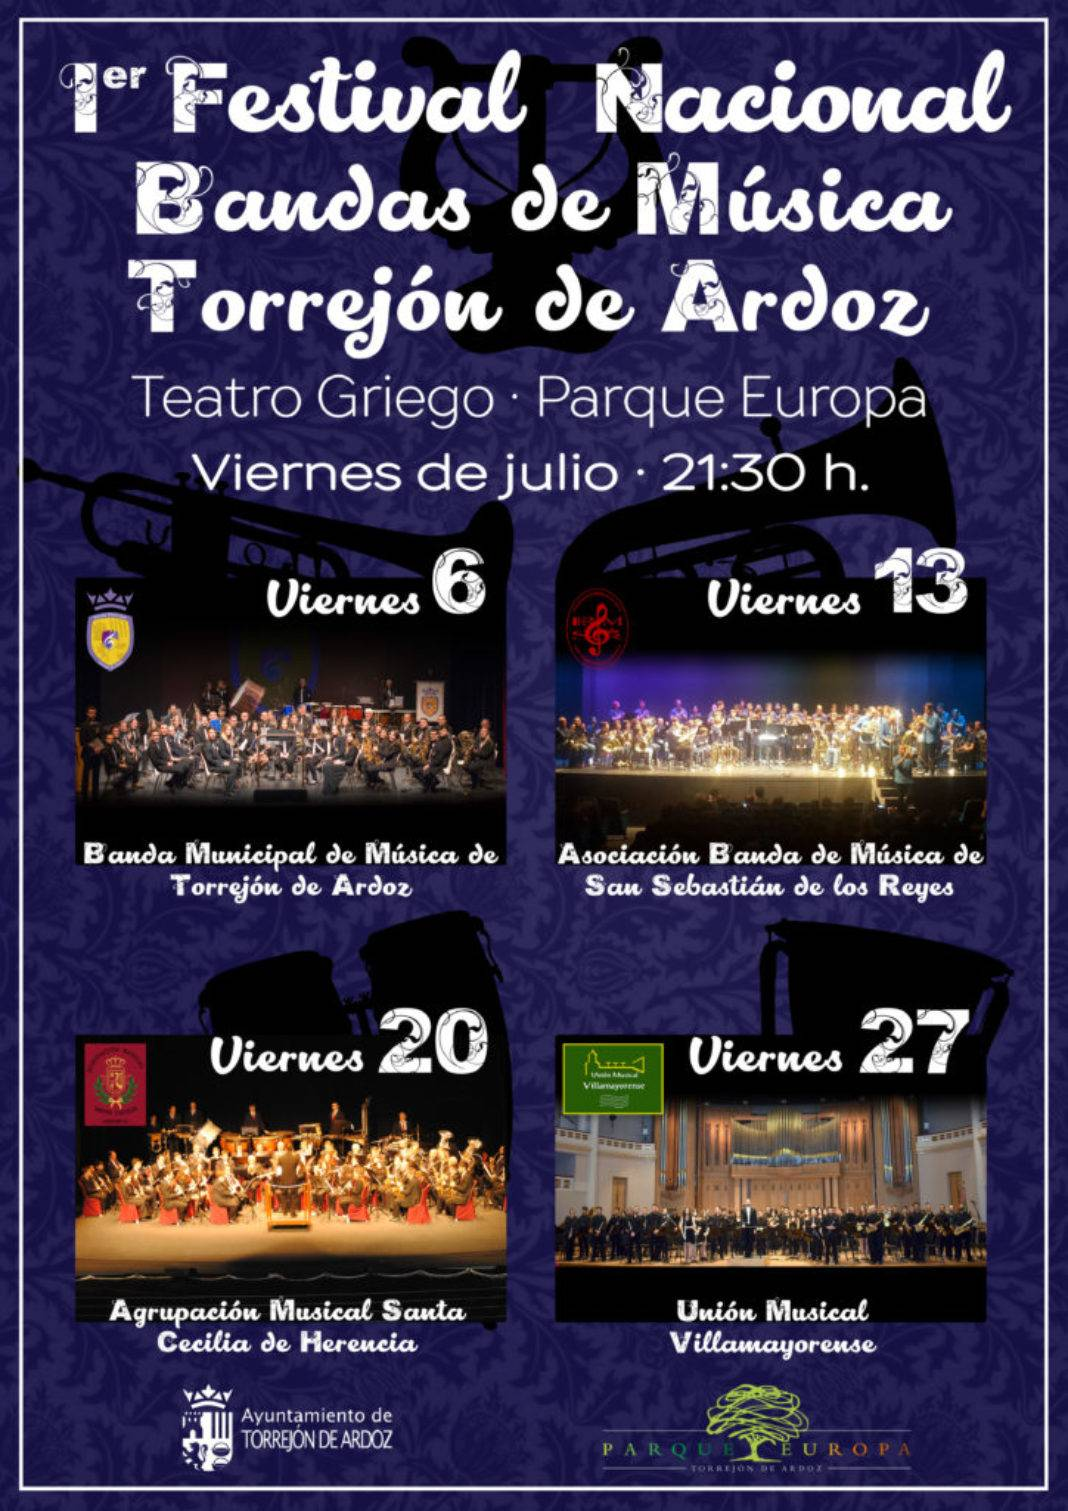 Herencia en el I Festival Nacional de Bandas de Música de Torrejón de Ardoz 4